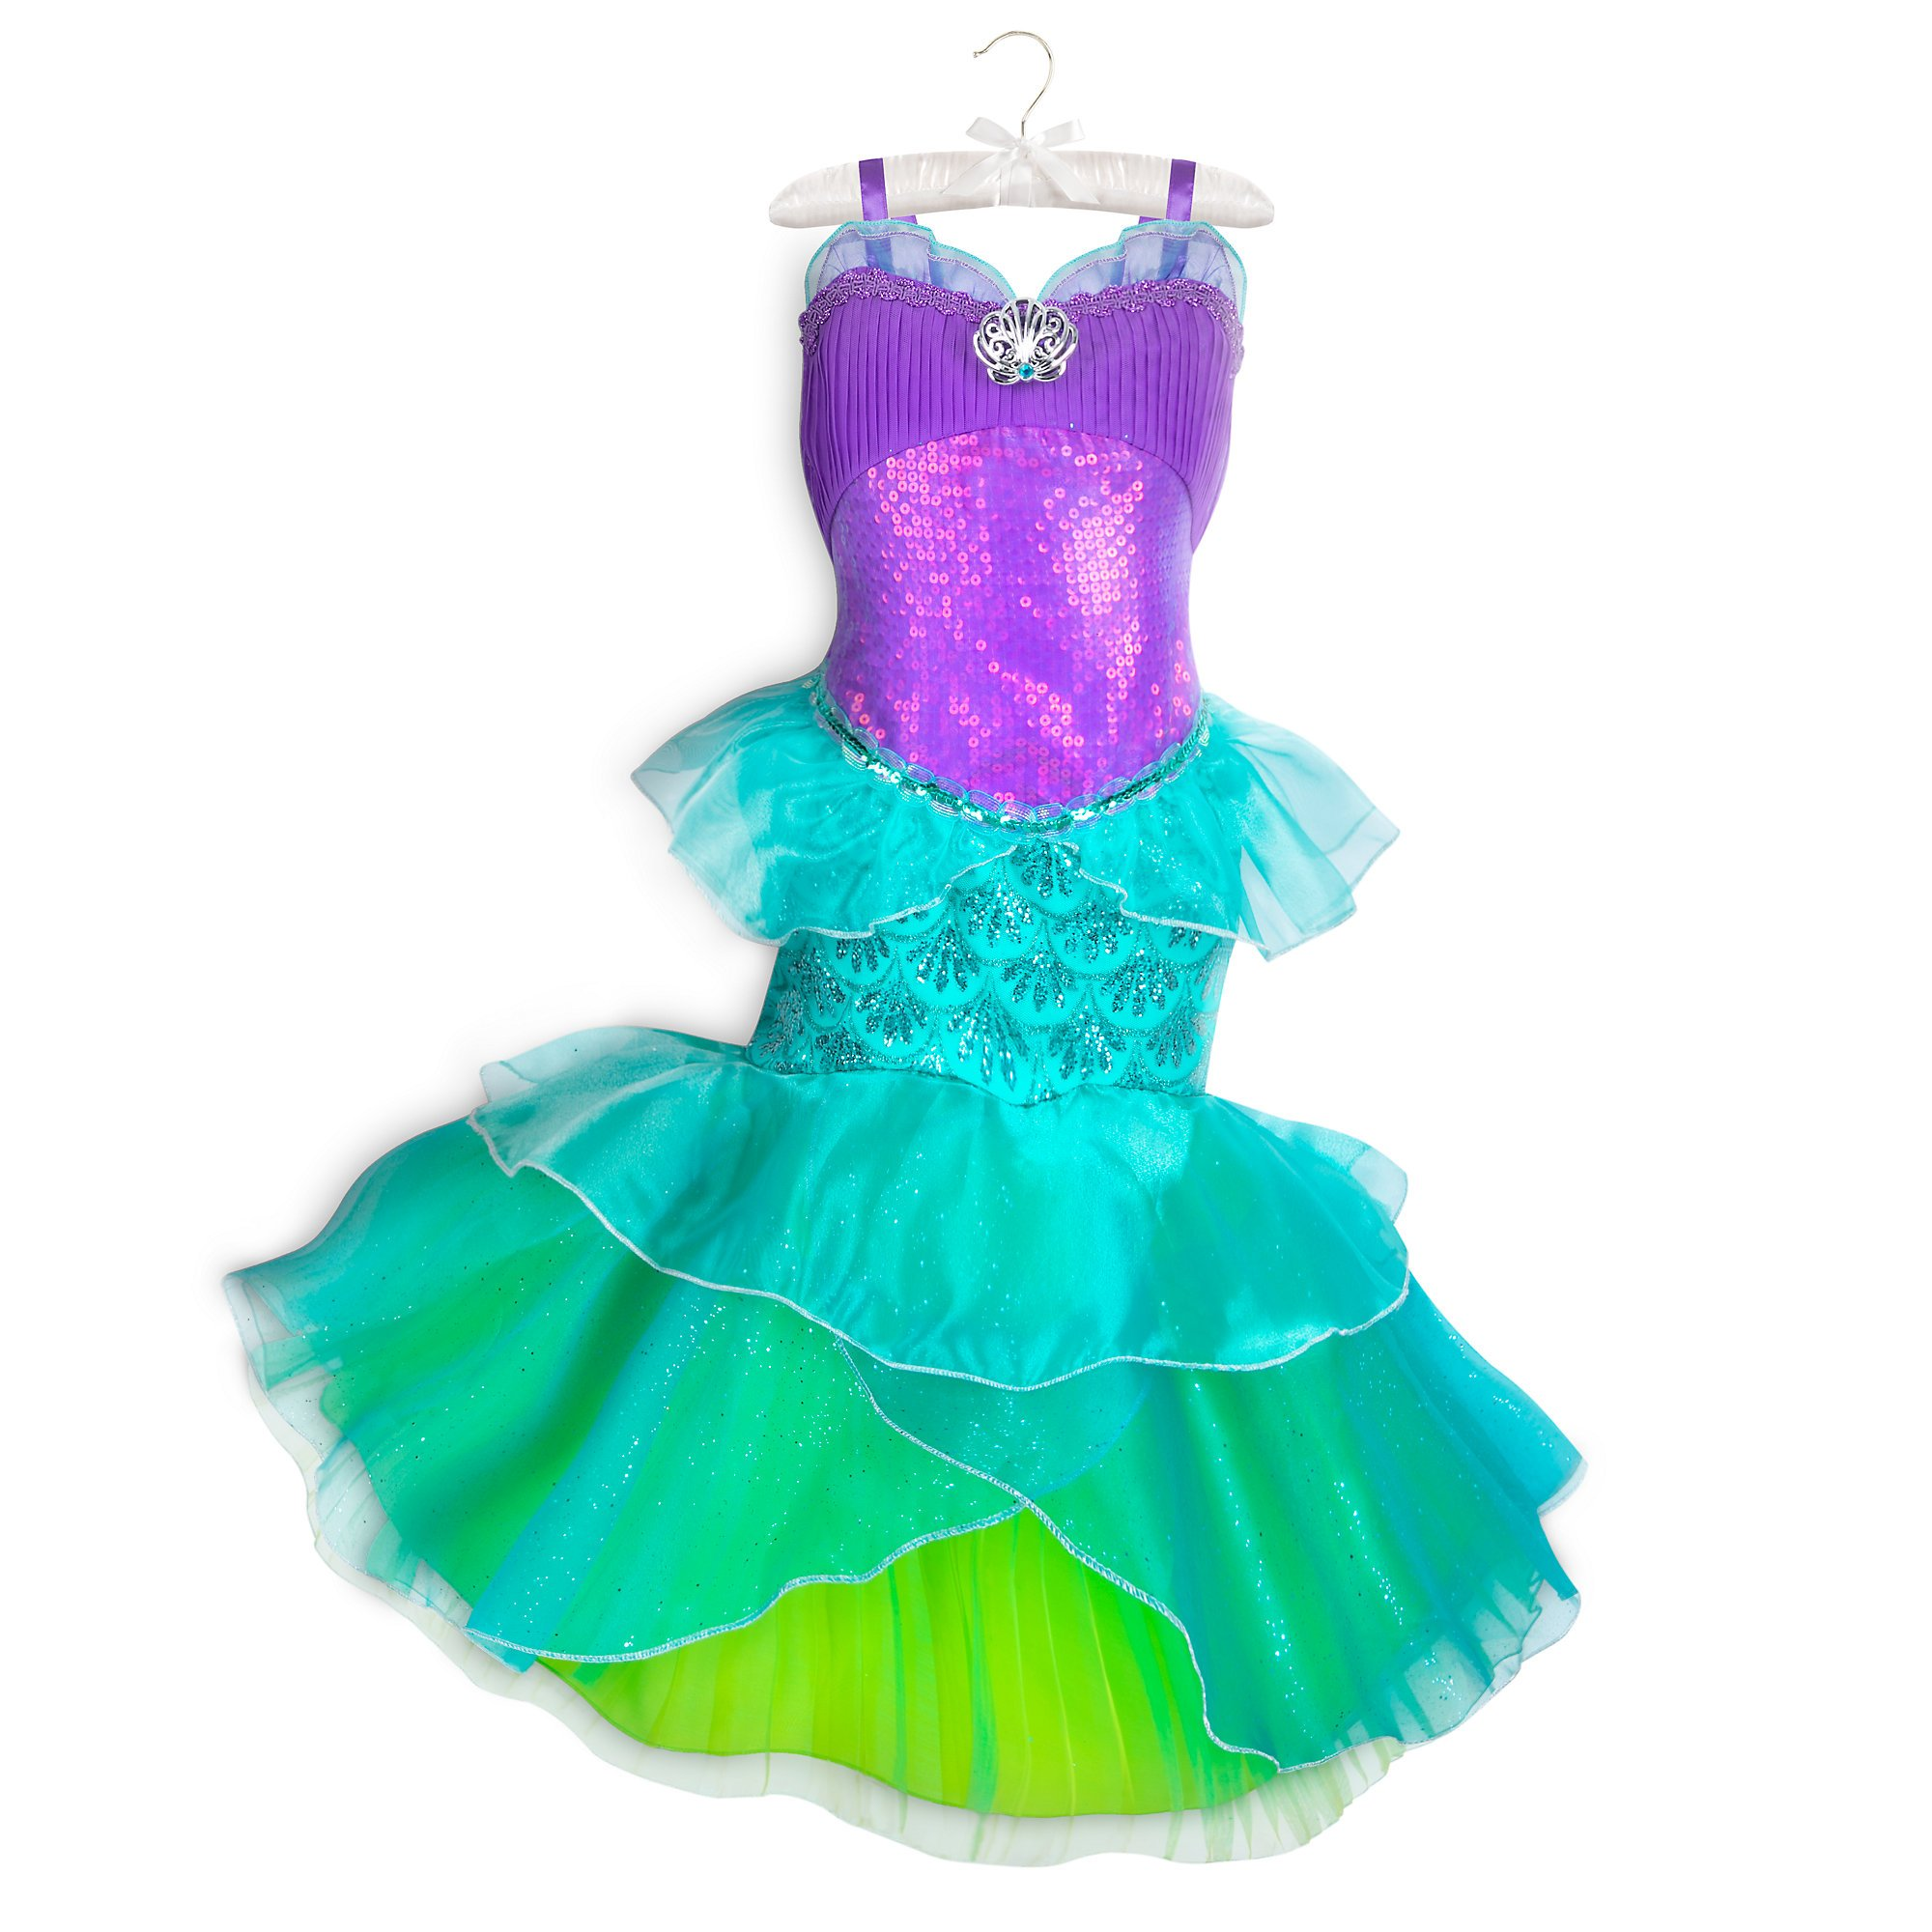 Disney Ariel Costume for Kids - The Little Mermaid